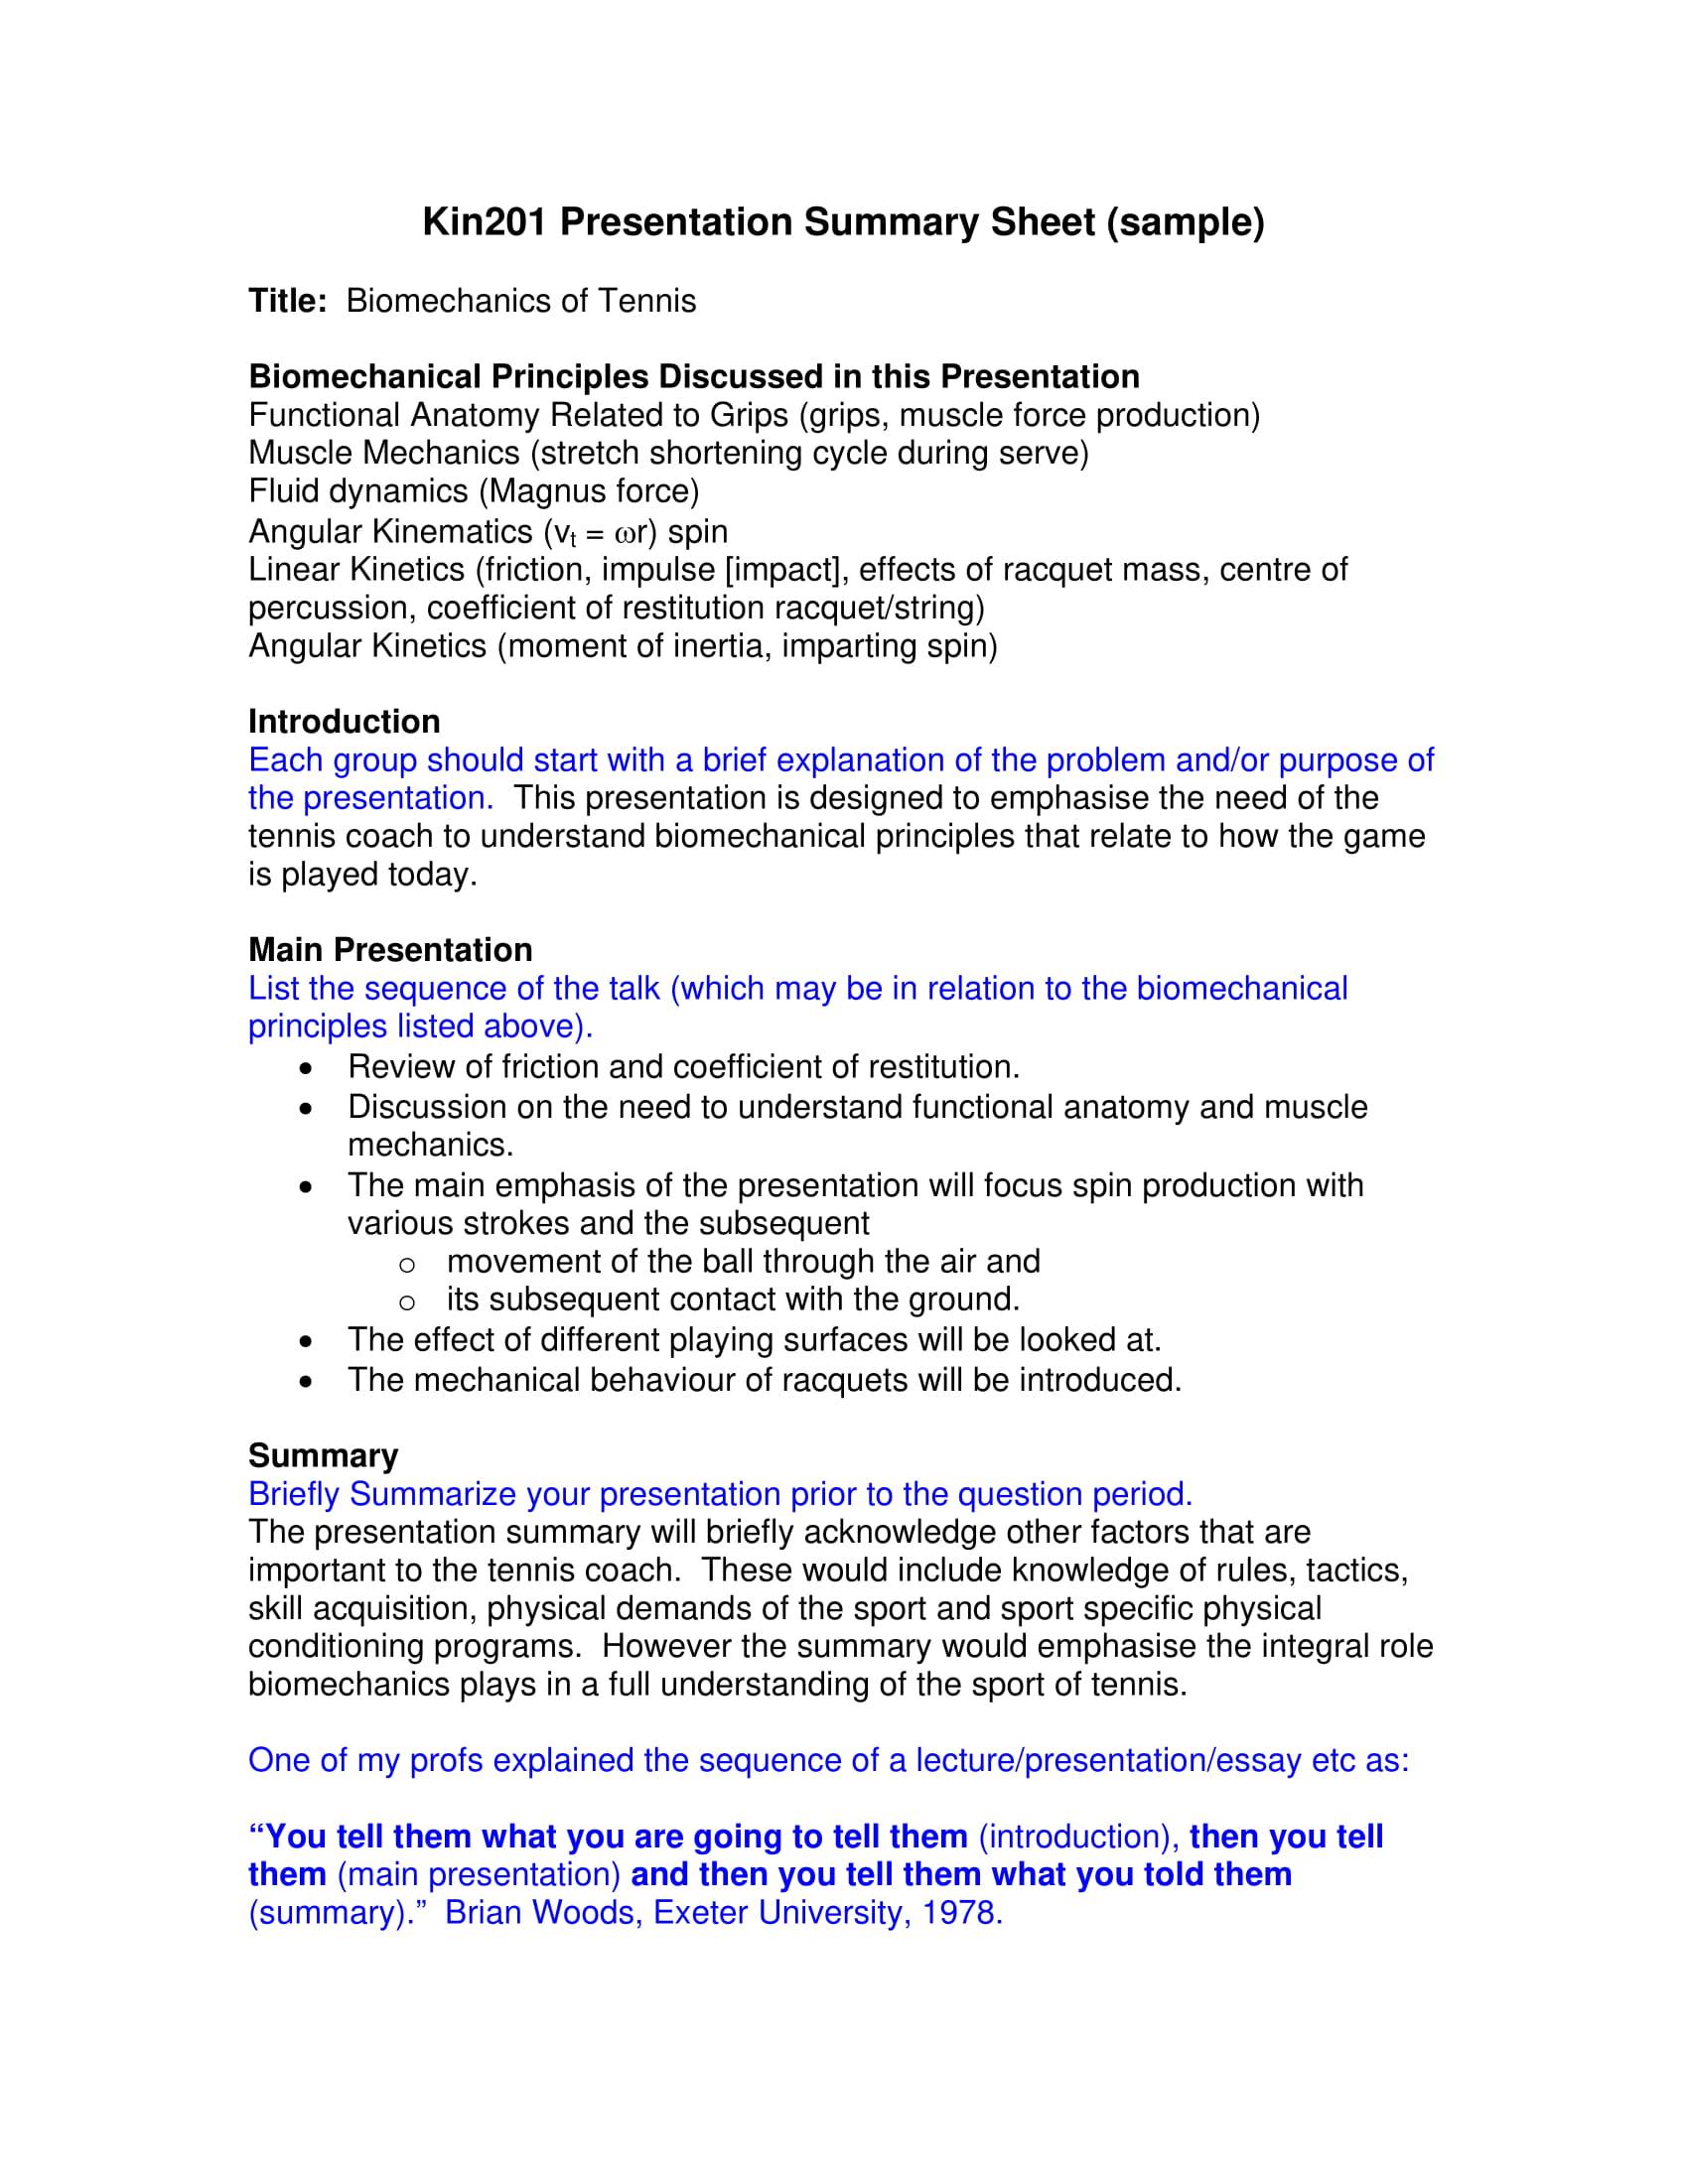 presentation summary sheet